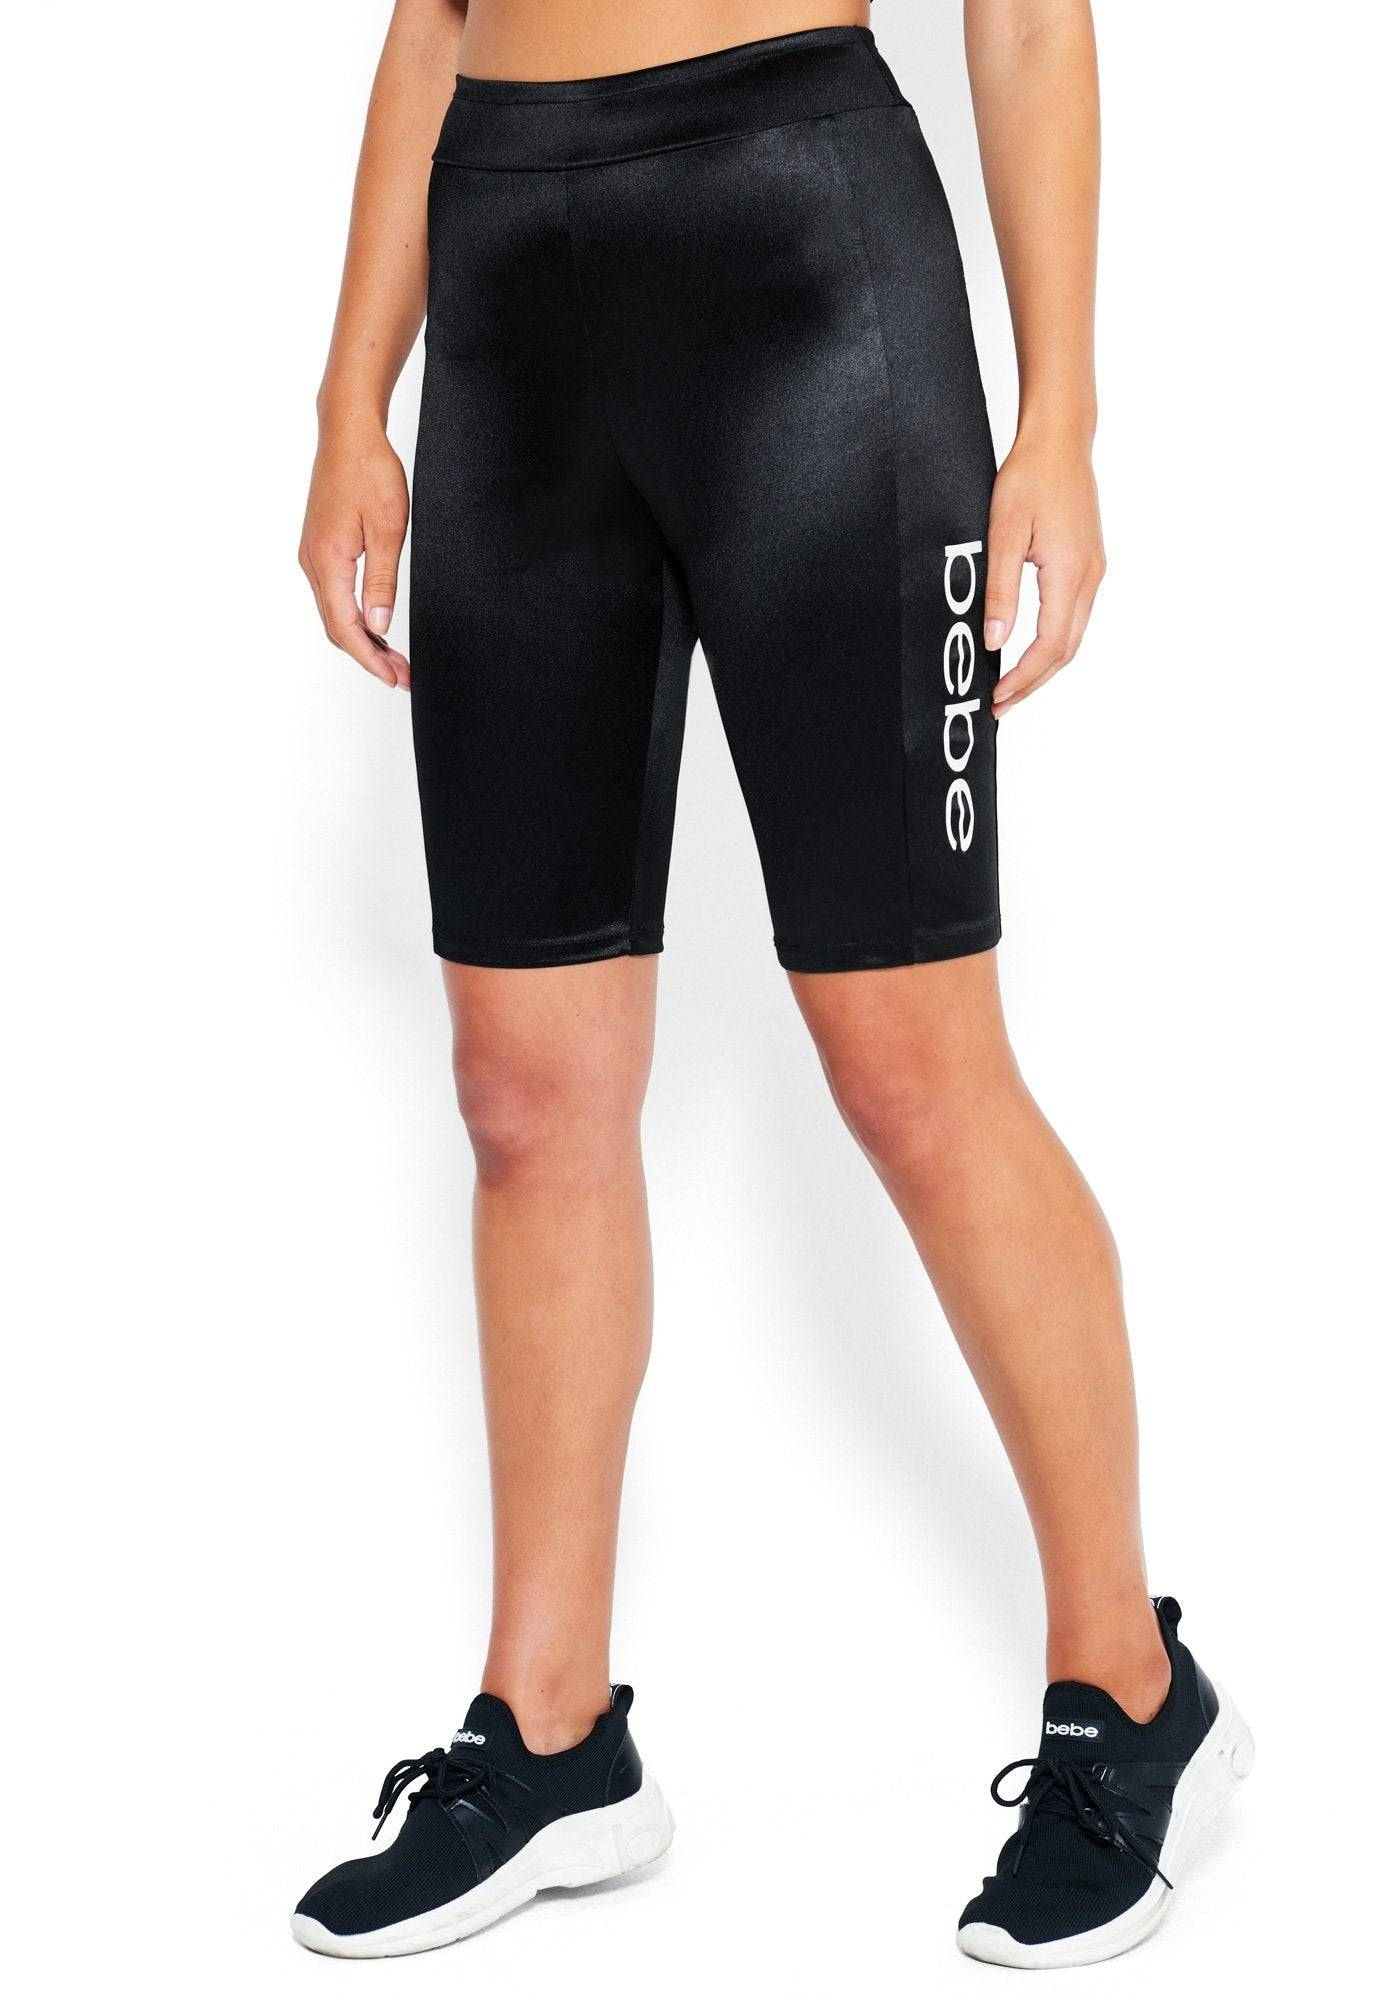 bebe Women's Mya Bebe Logo Bike Shorts, Size XS in Black Spandex